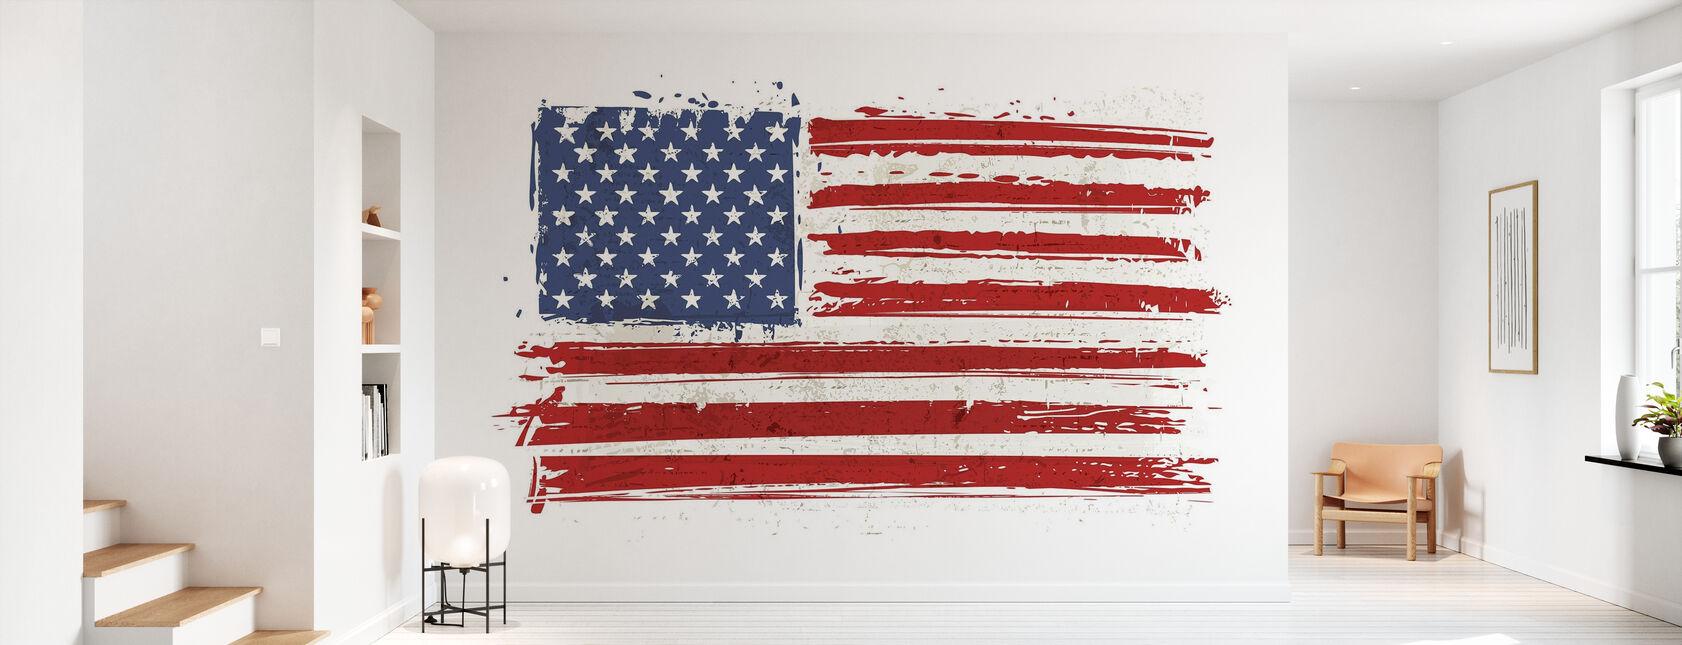 Flag USA - Papel pintado - Corredor